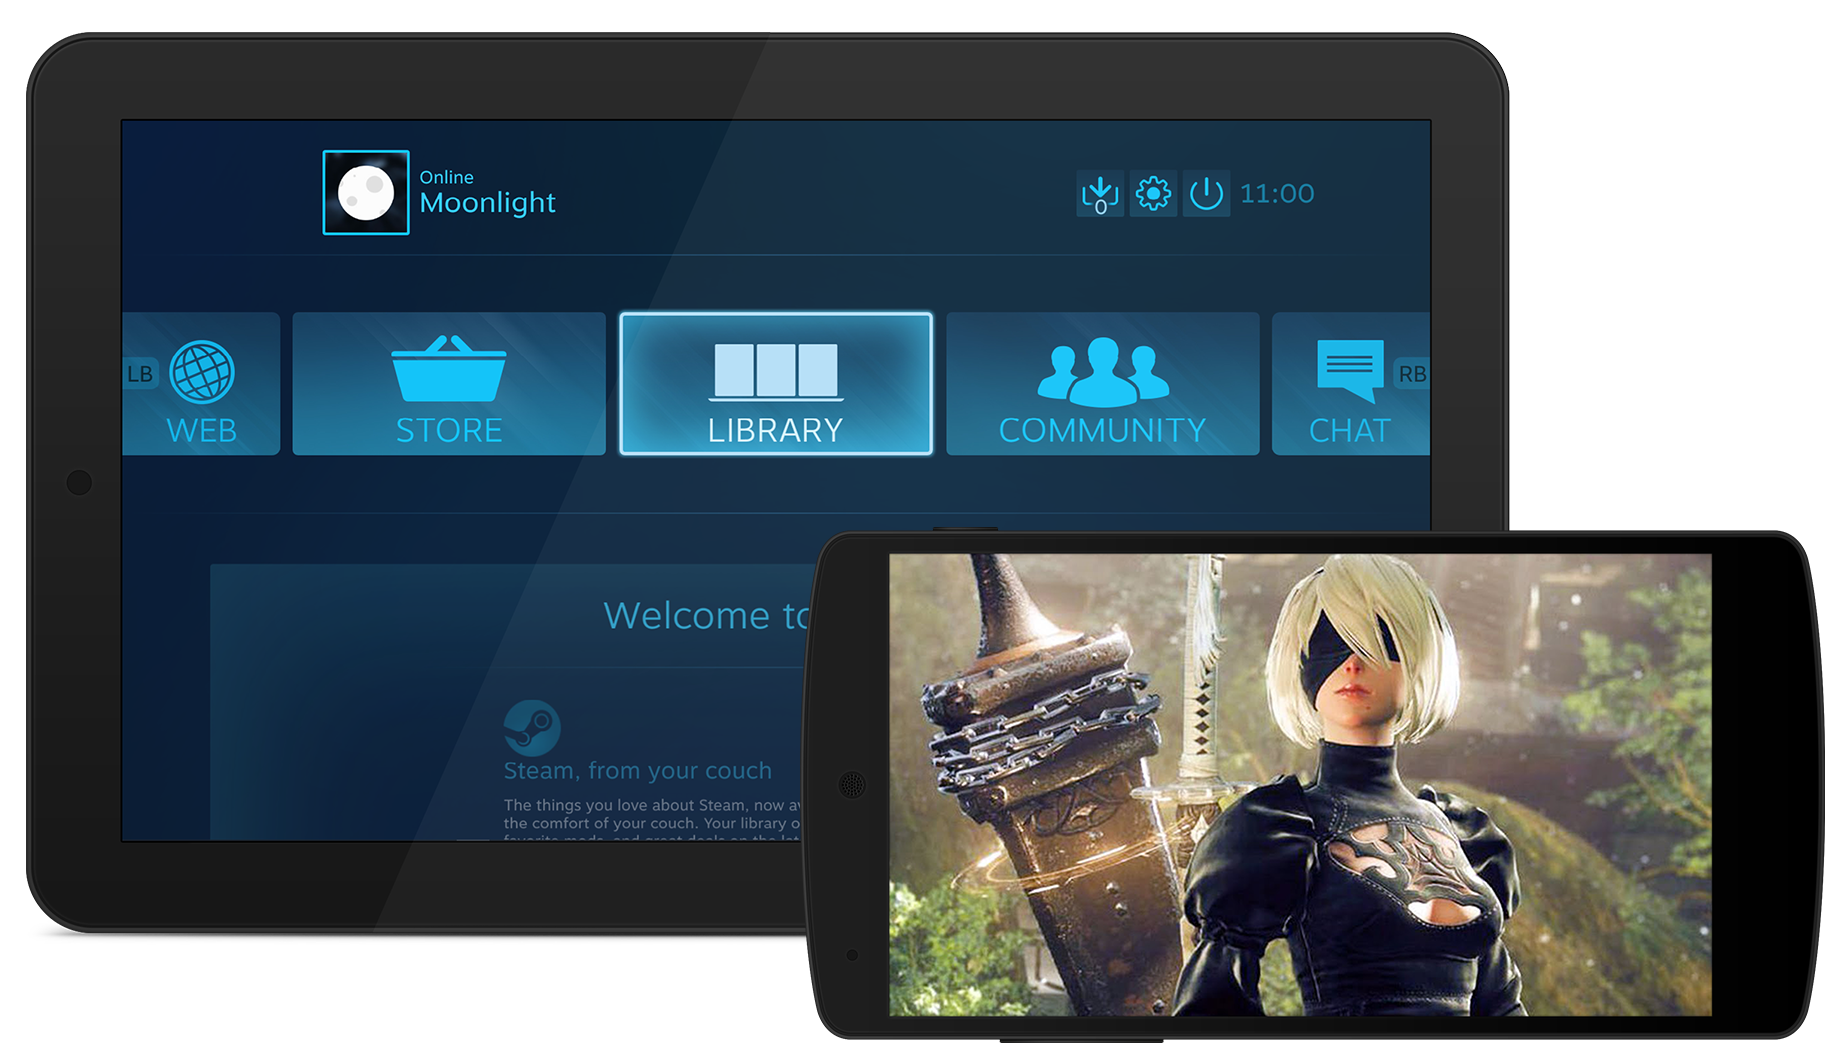 Moonlight Game Streaming Moonlight game, Game streaming